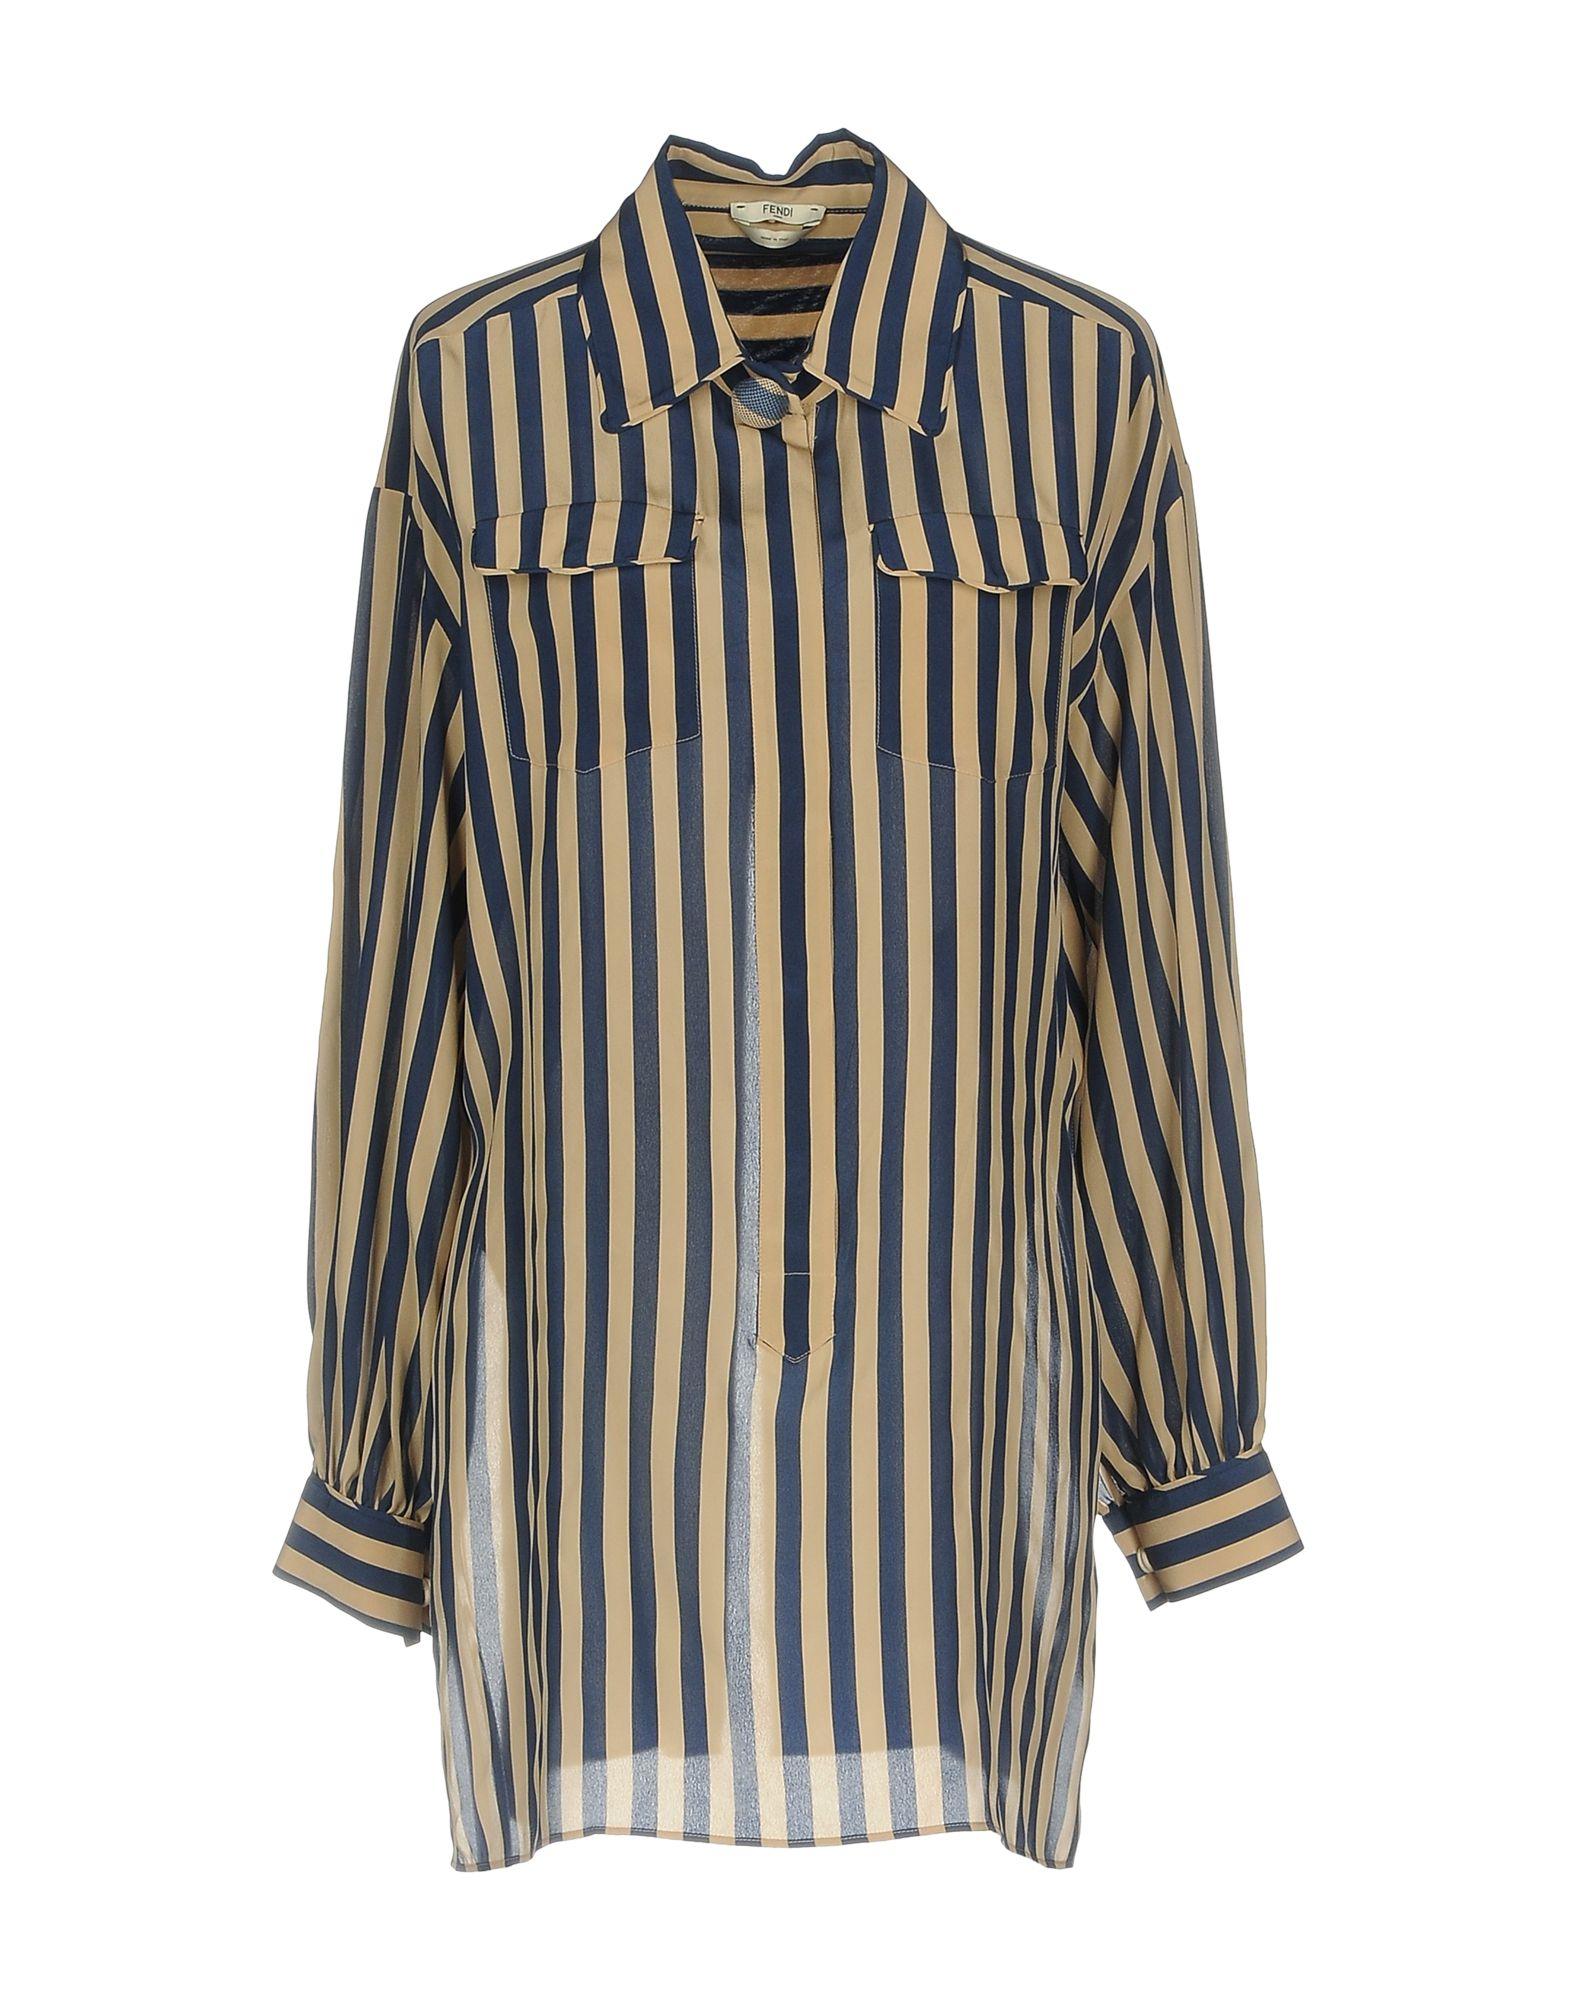 FENDI Damen Bluse Farbe Dunkelblau Größe 4